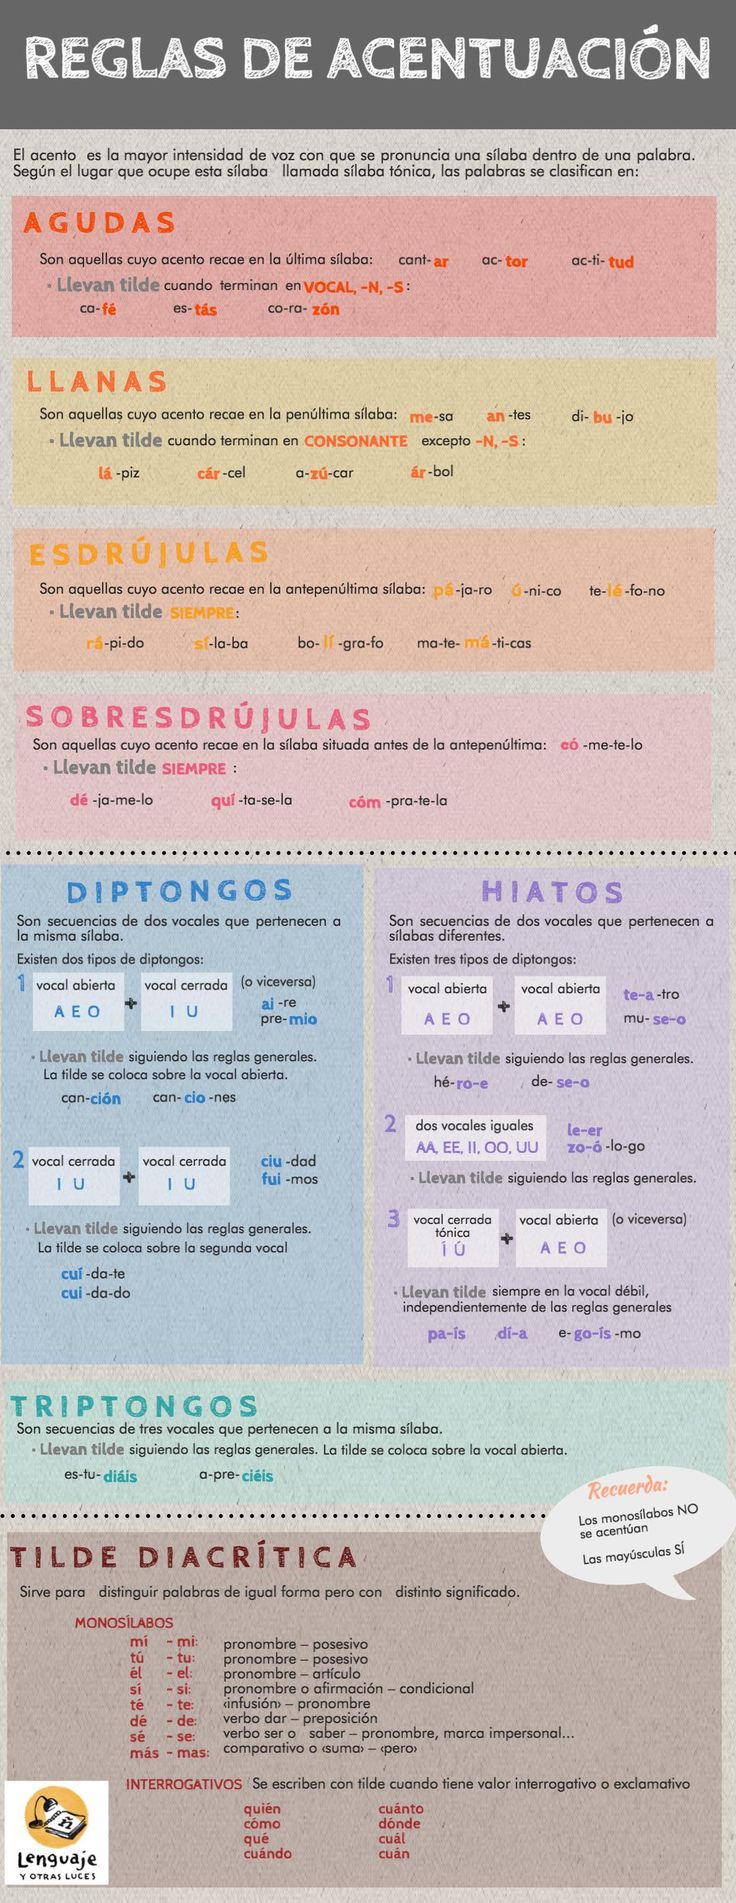 Reglas completas (diptongos, hiatos, diacrítica), HUMOR relacionado con la acentuación, VÍDEO... Muy completo. ✿ Spanish Learning∕ Teaching Spanish ∕ Spanish Language ∕ Spanish vocabulary ∕ Spoken Spanish ✿ Share it with people who are serious about learning Spanish!